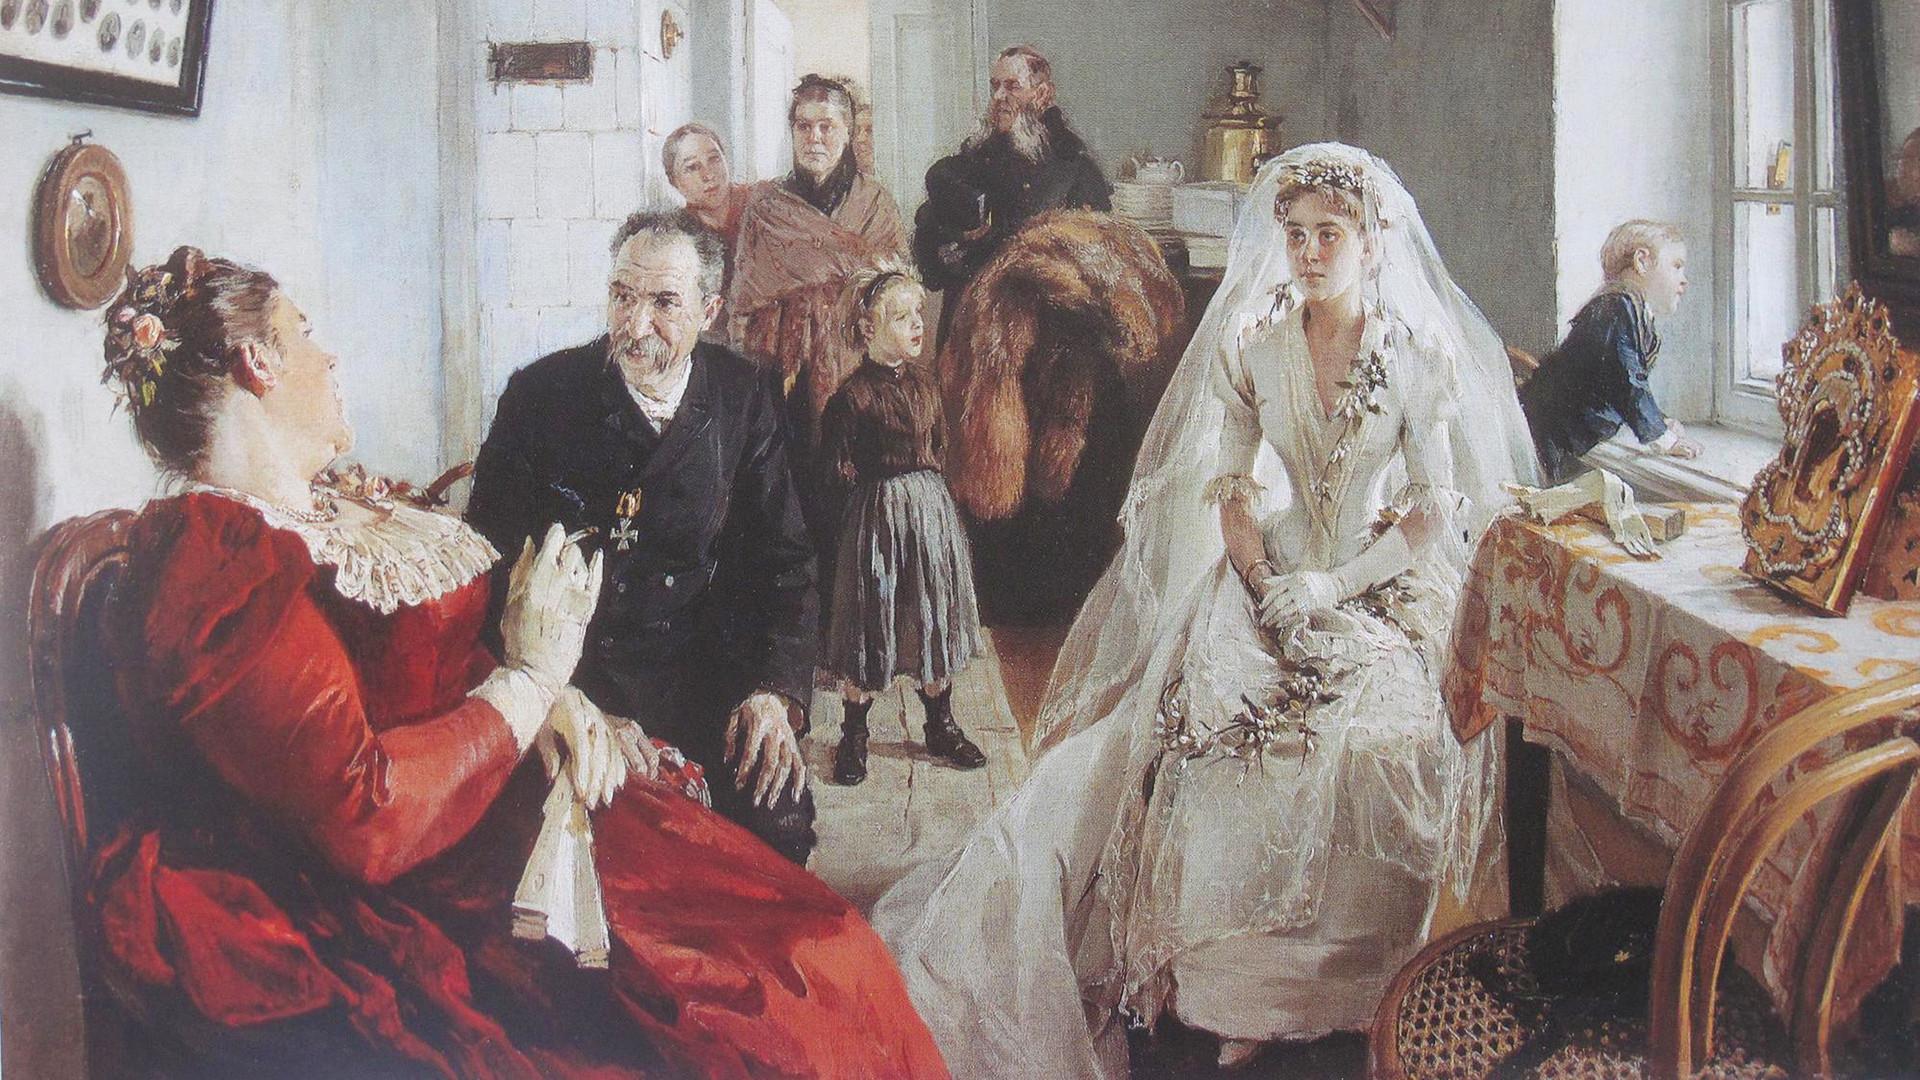 Waiting for the groomsman. I.Pryanishnikov.